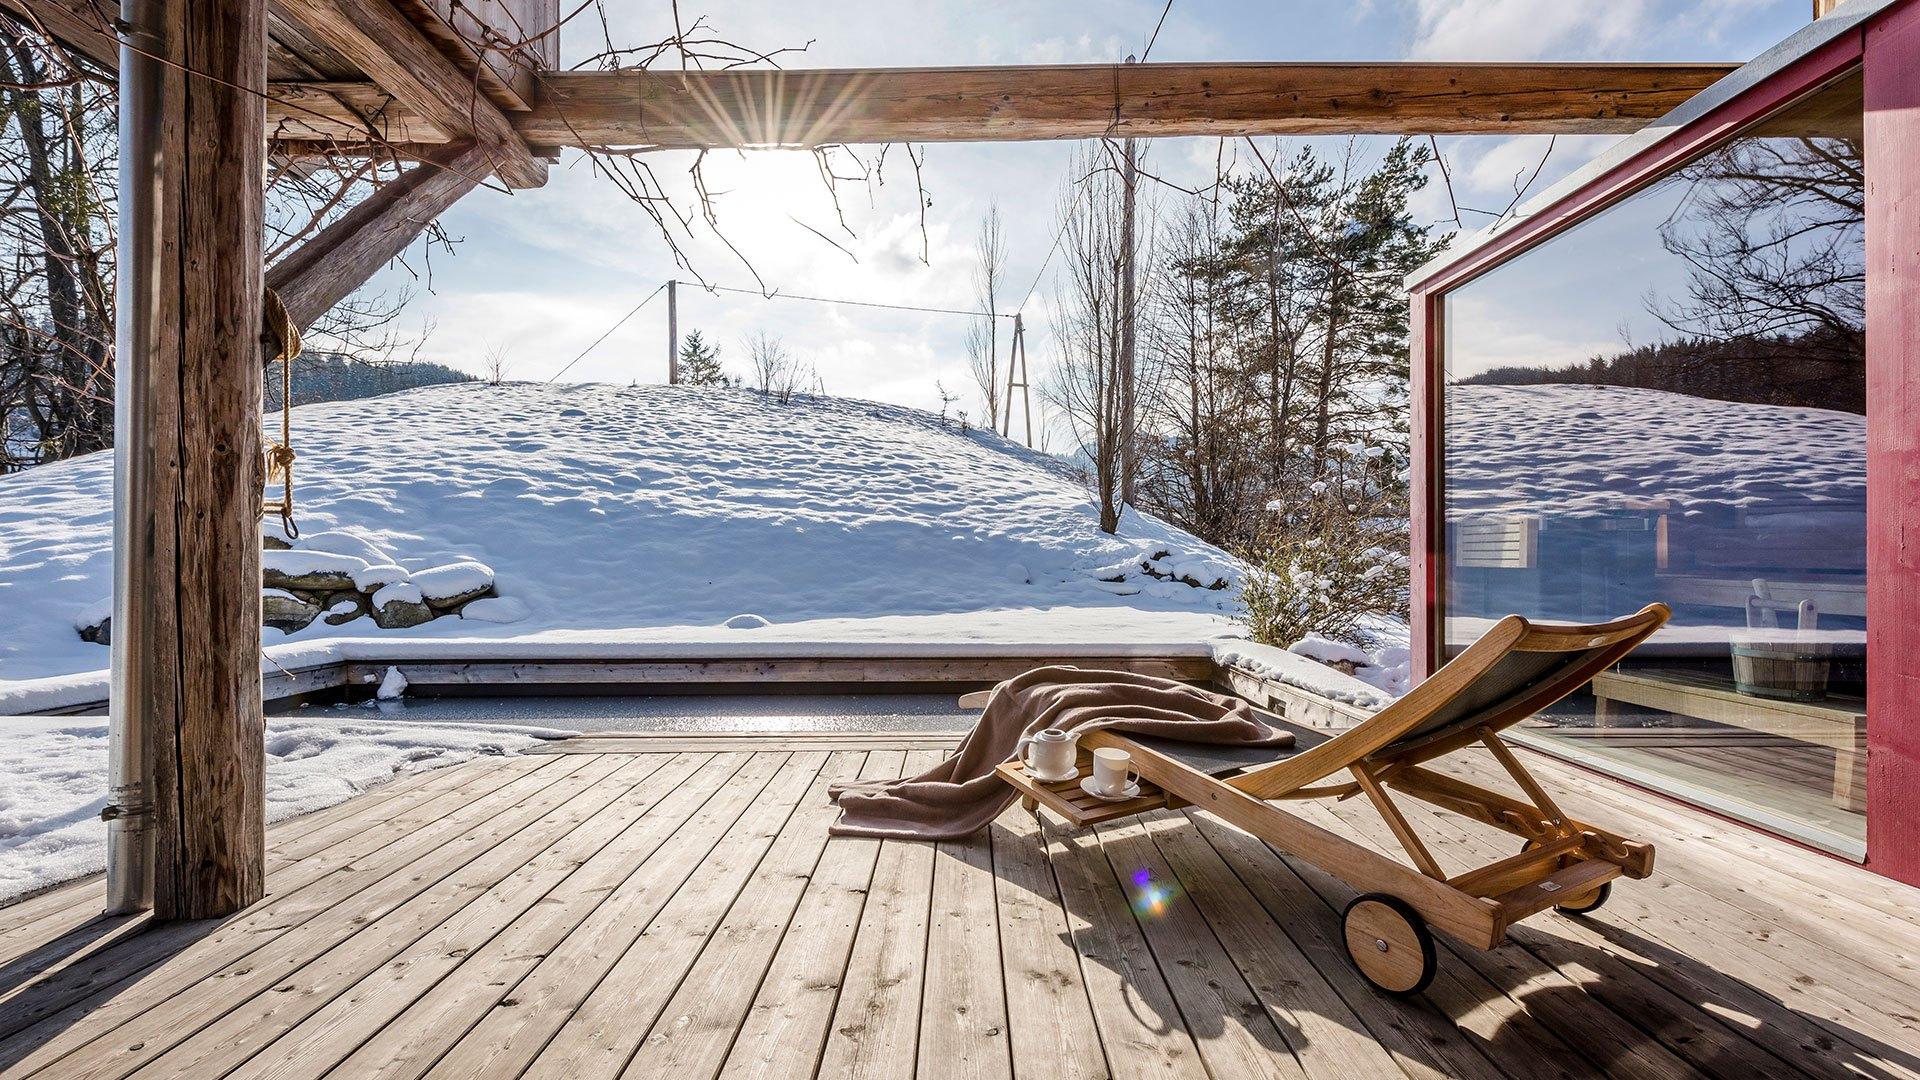 stadl-tunauberg-winter-terrasse-1920x1080